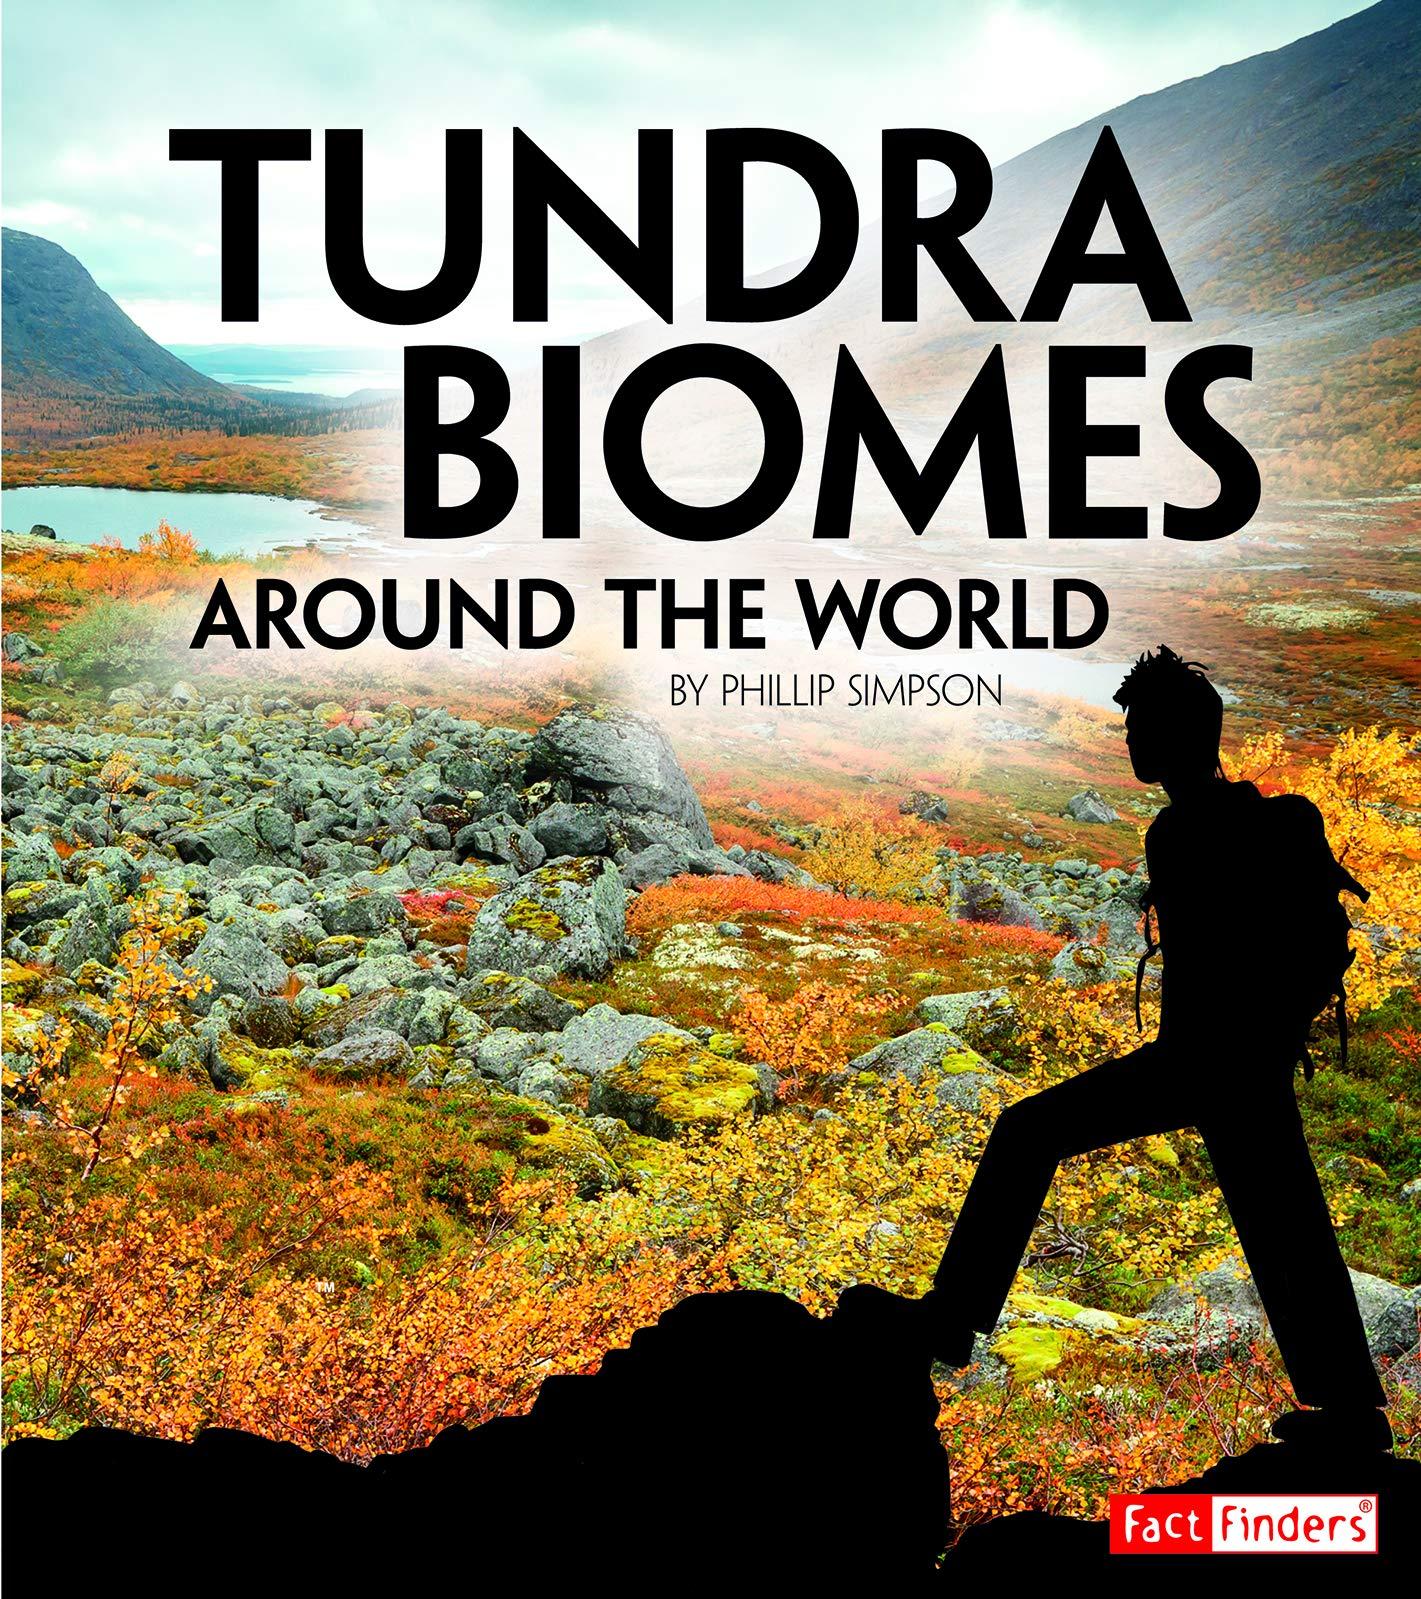 Tundra Biomes Around the World (Exploring Earth's Biomes